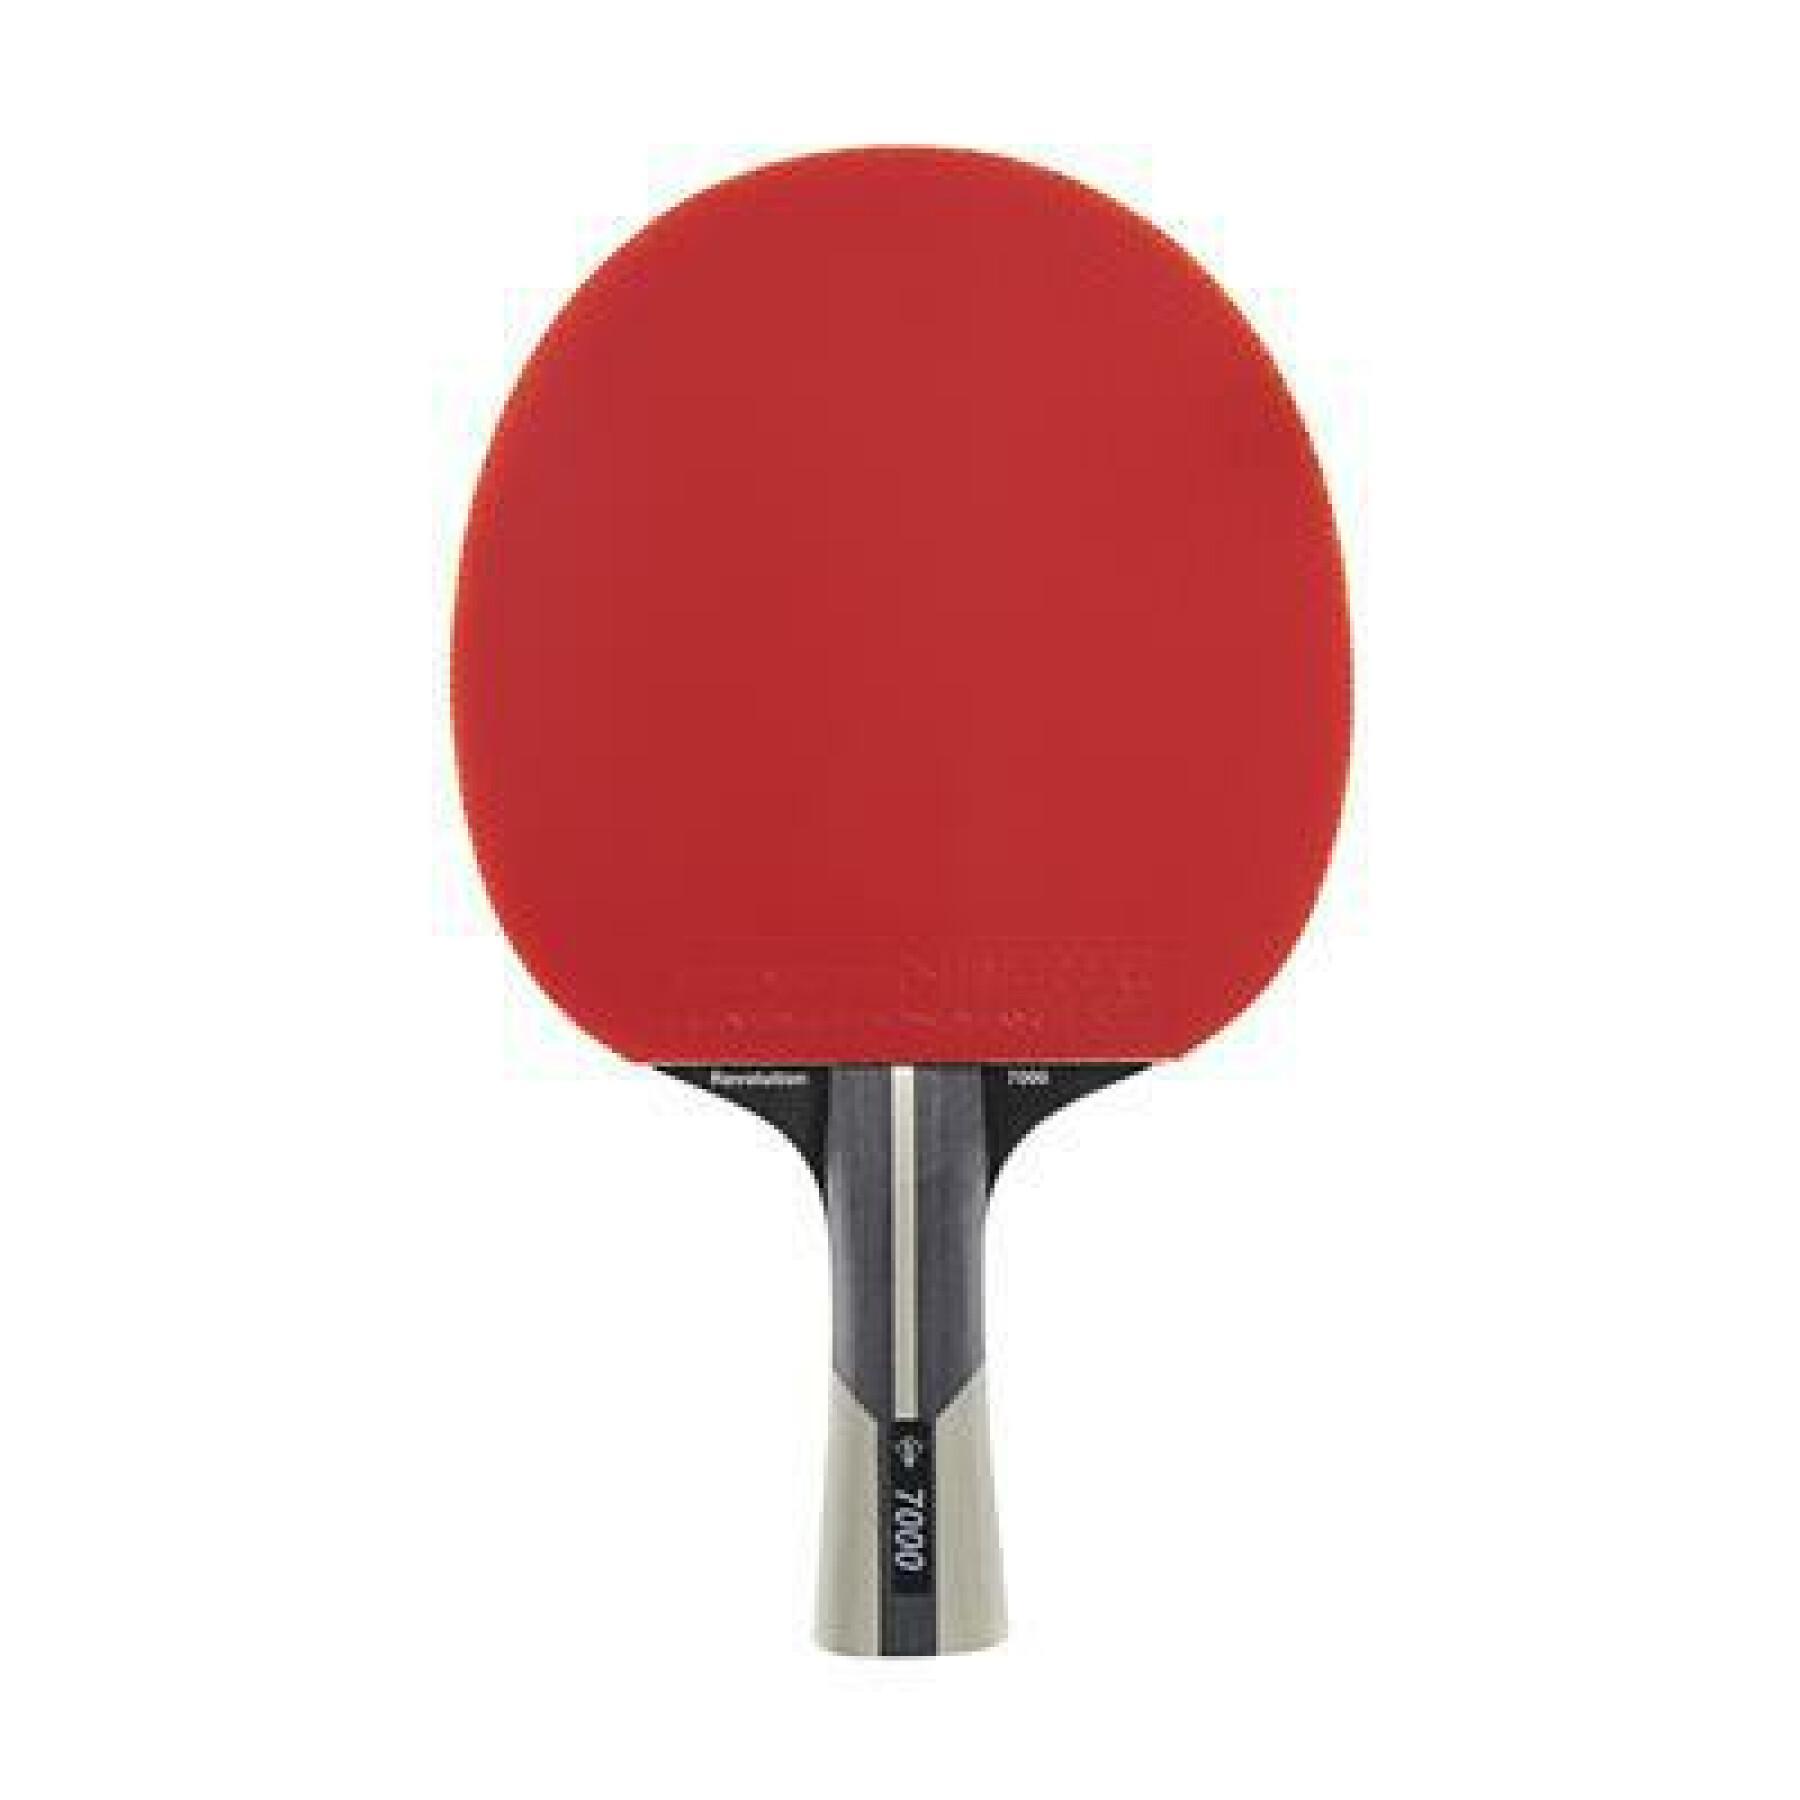 Racket Dunlop revolution 7000